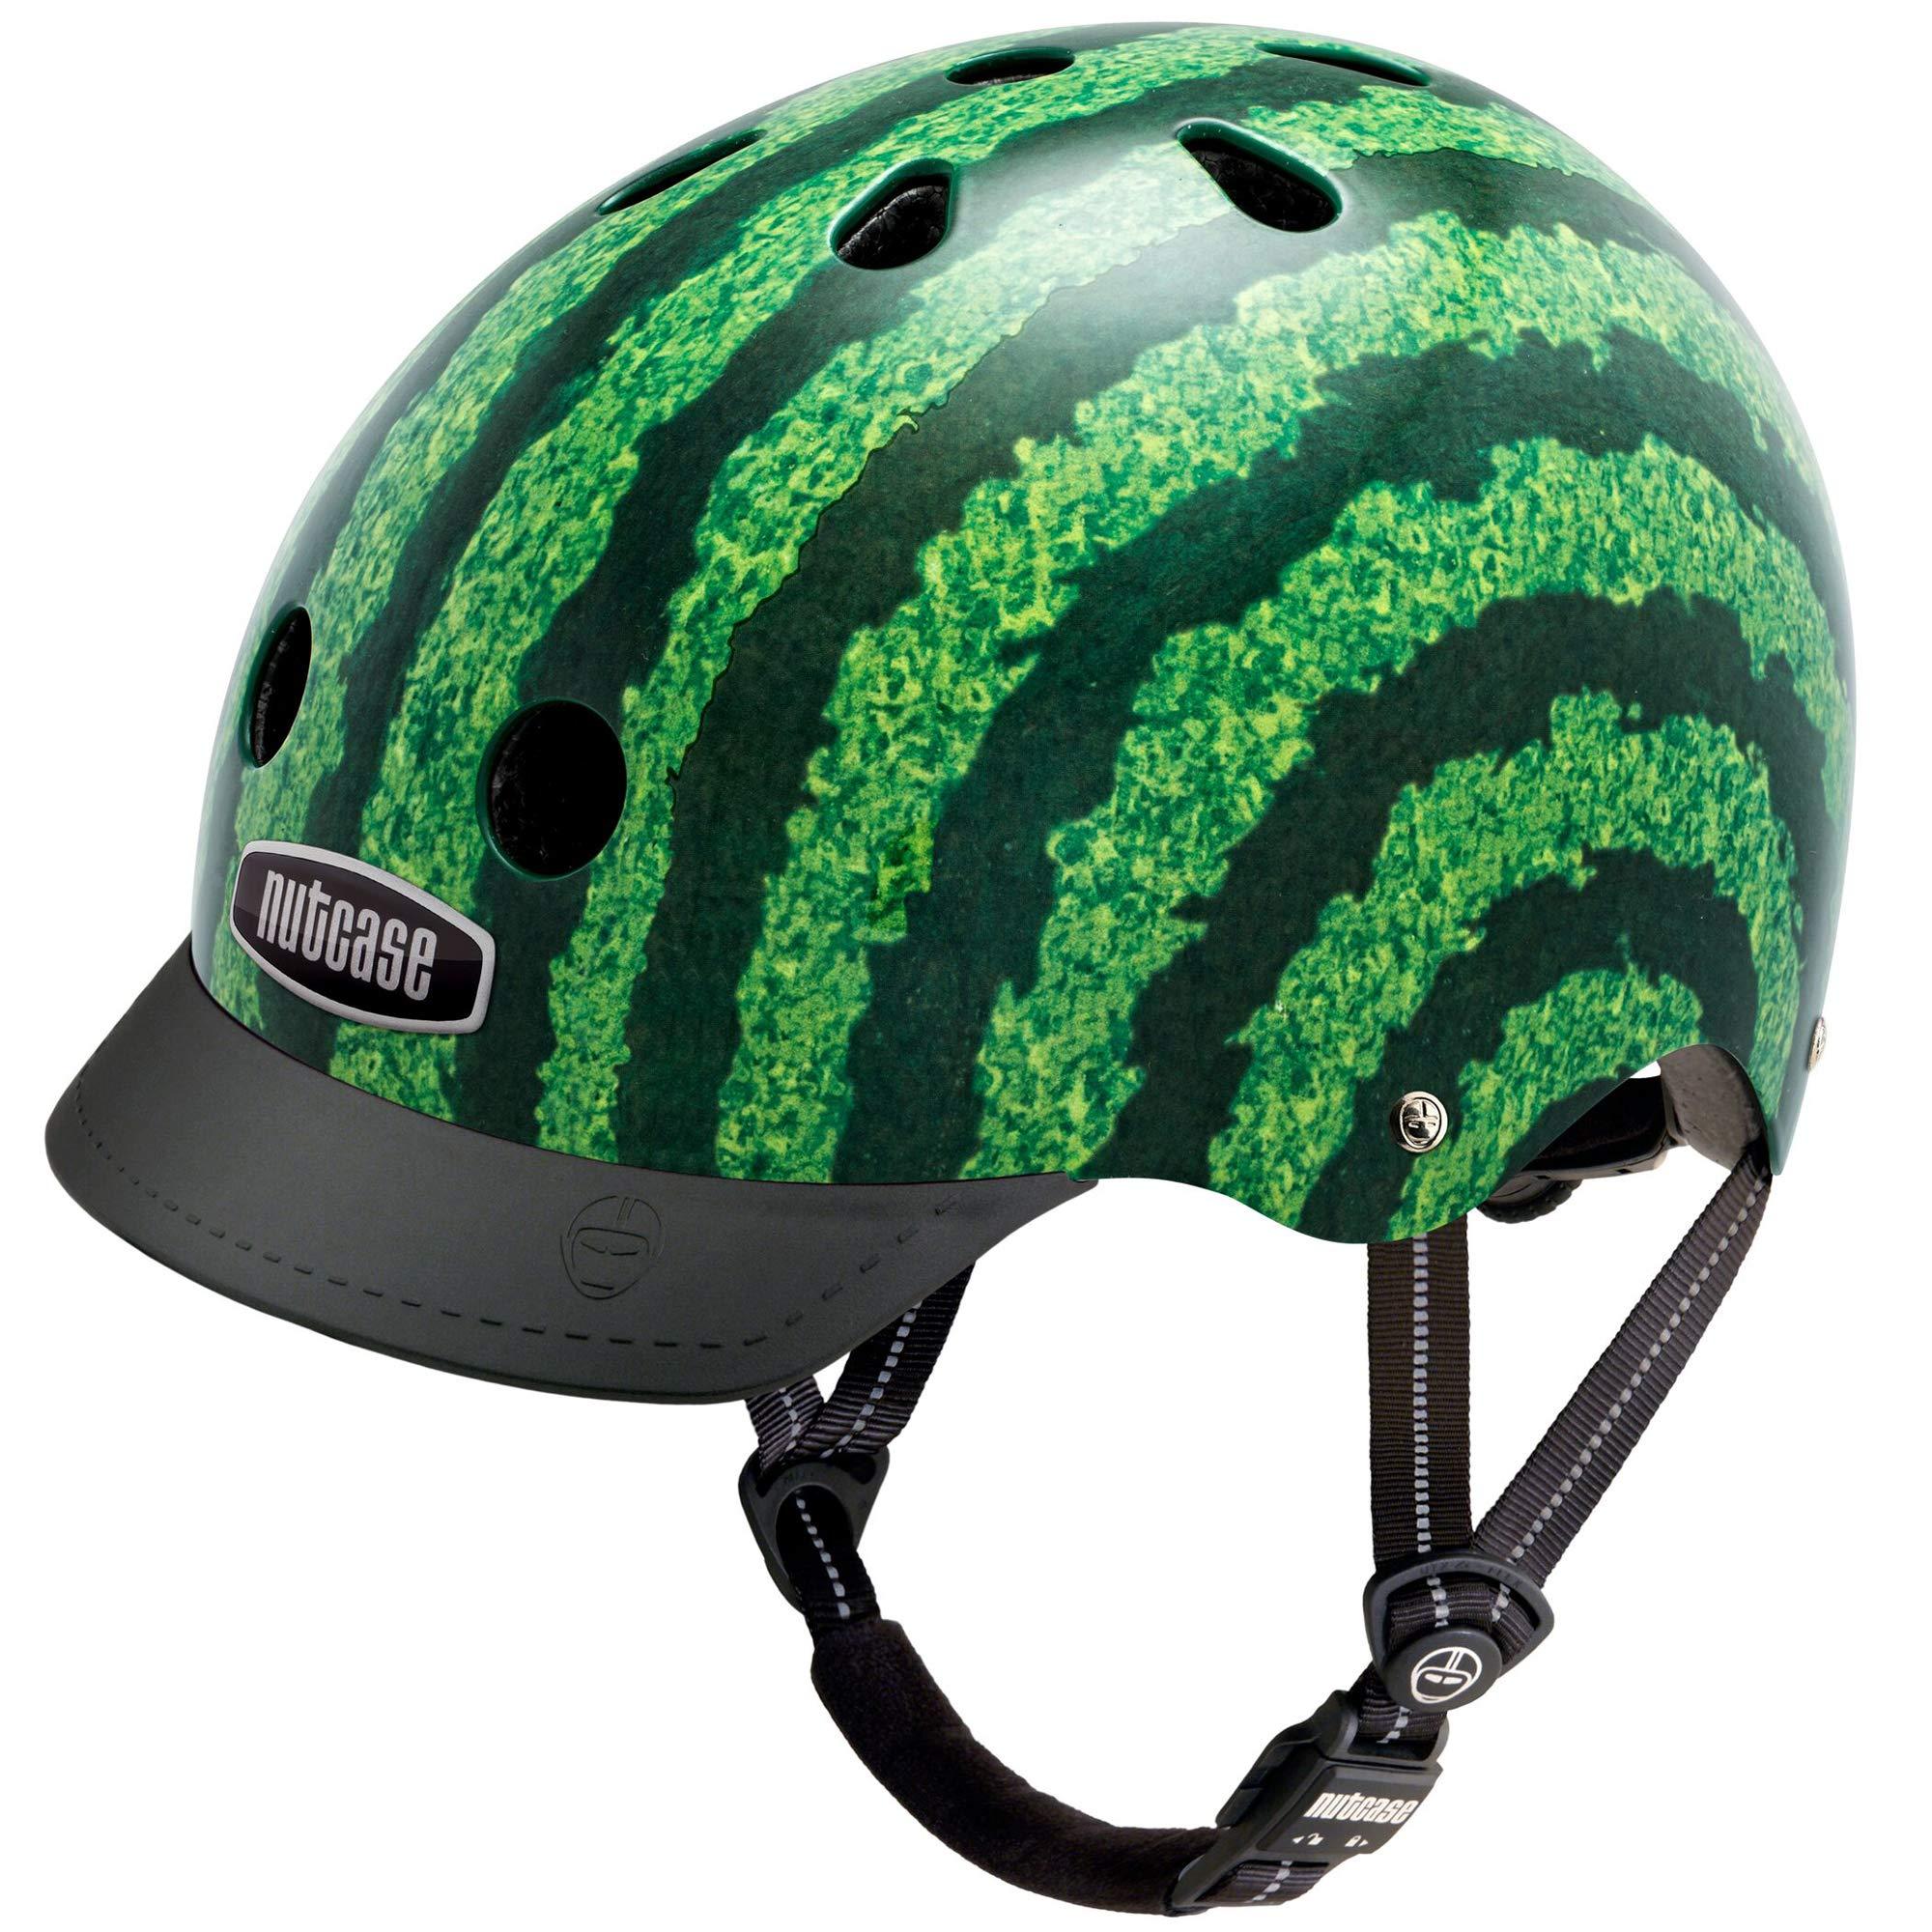 Nutcase - Patterned Street Bike Helmet for Adults, Watermelon, Large